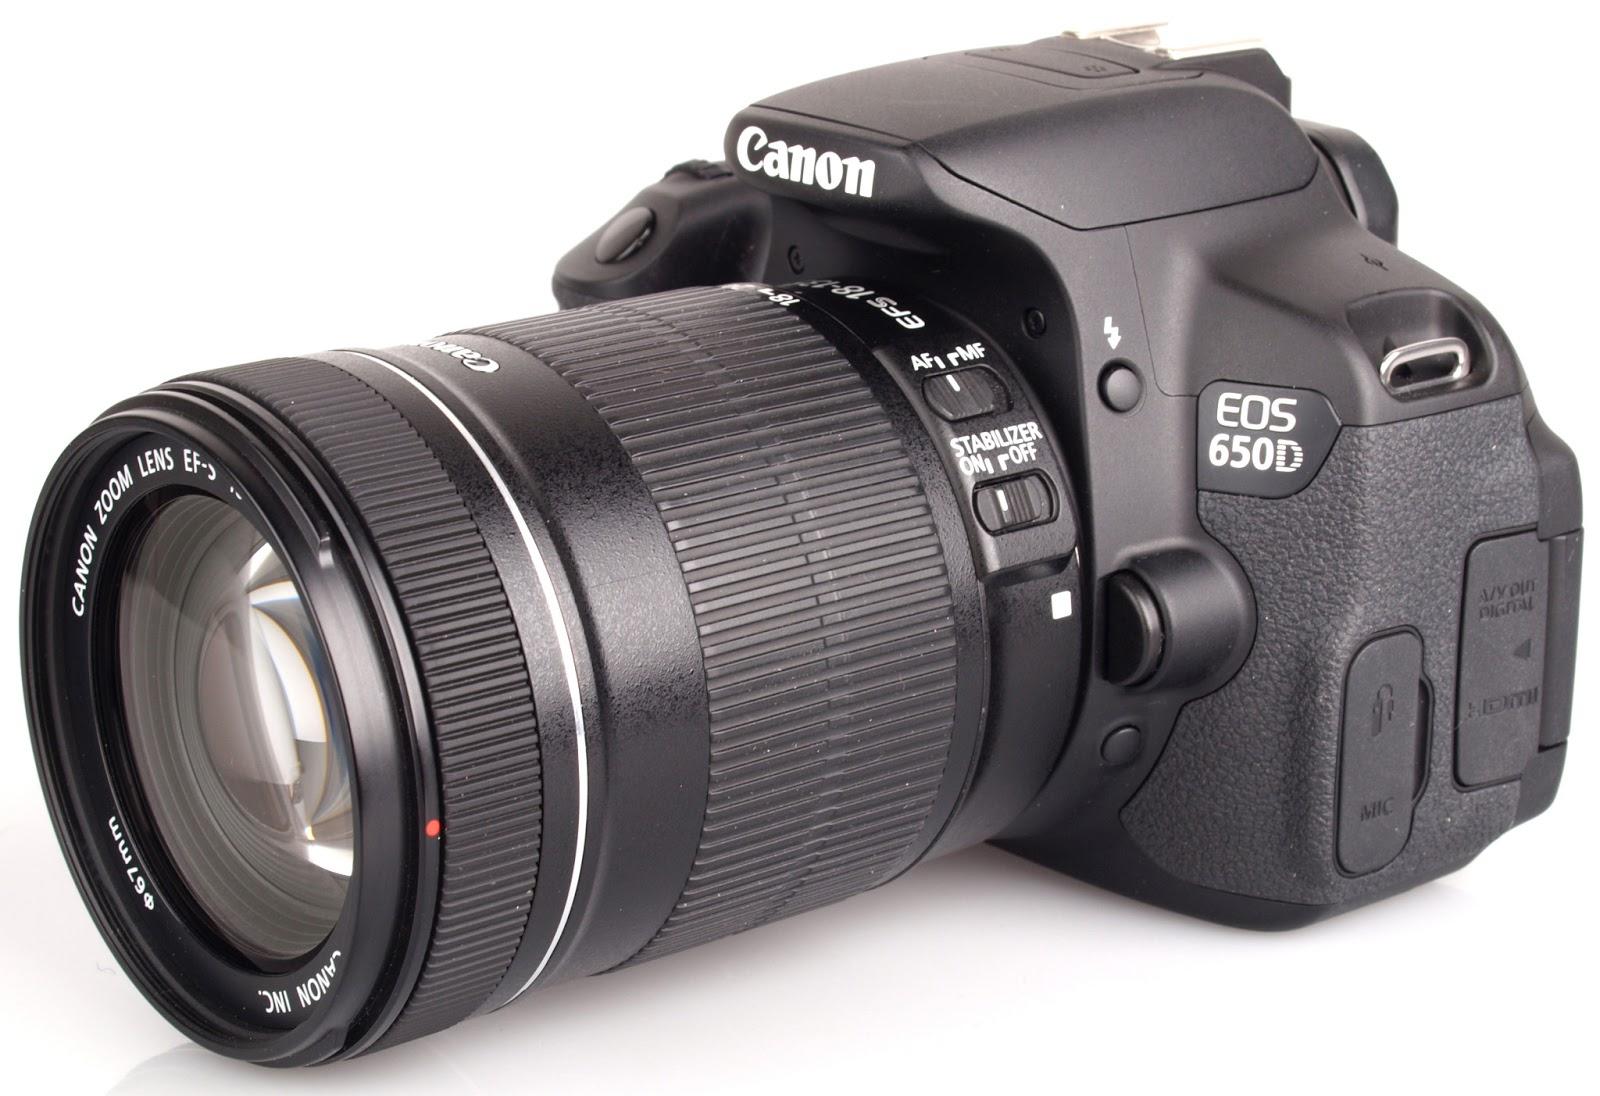 harga kamera dslr canon eos terbaru juli 2013 harga kamera dslr canon